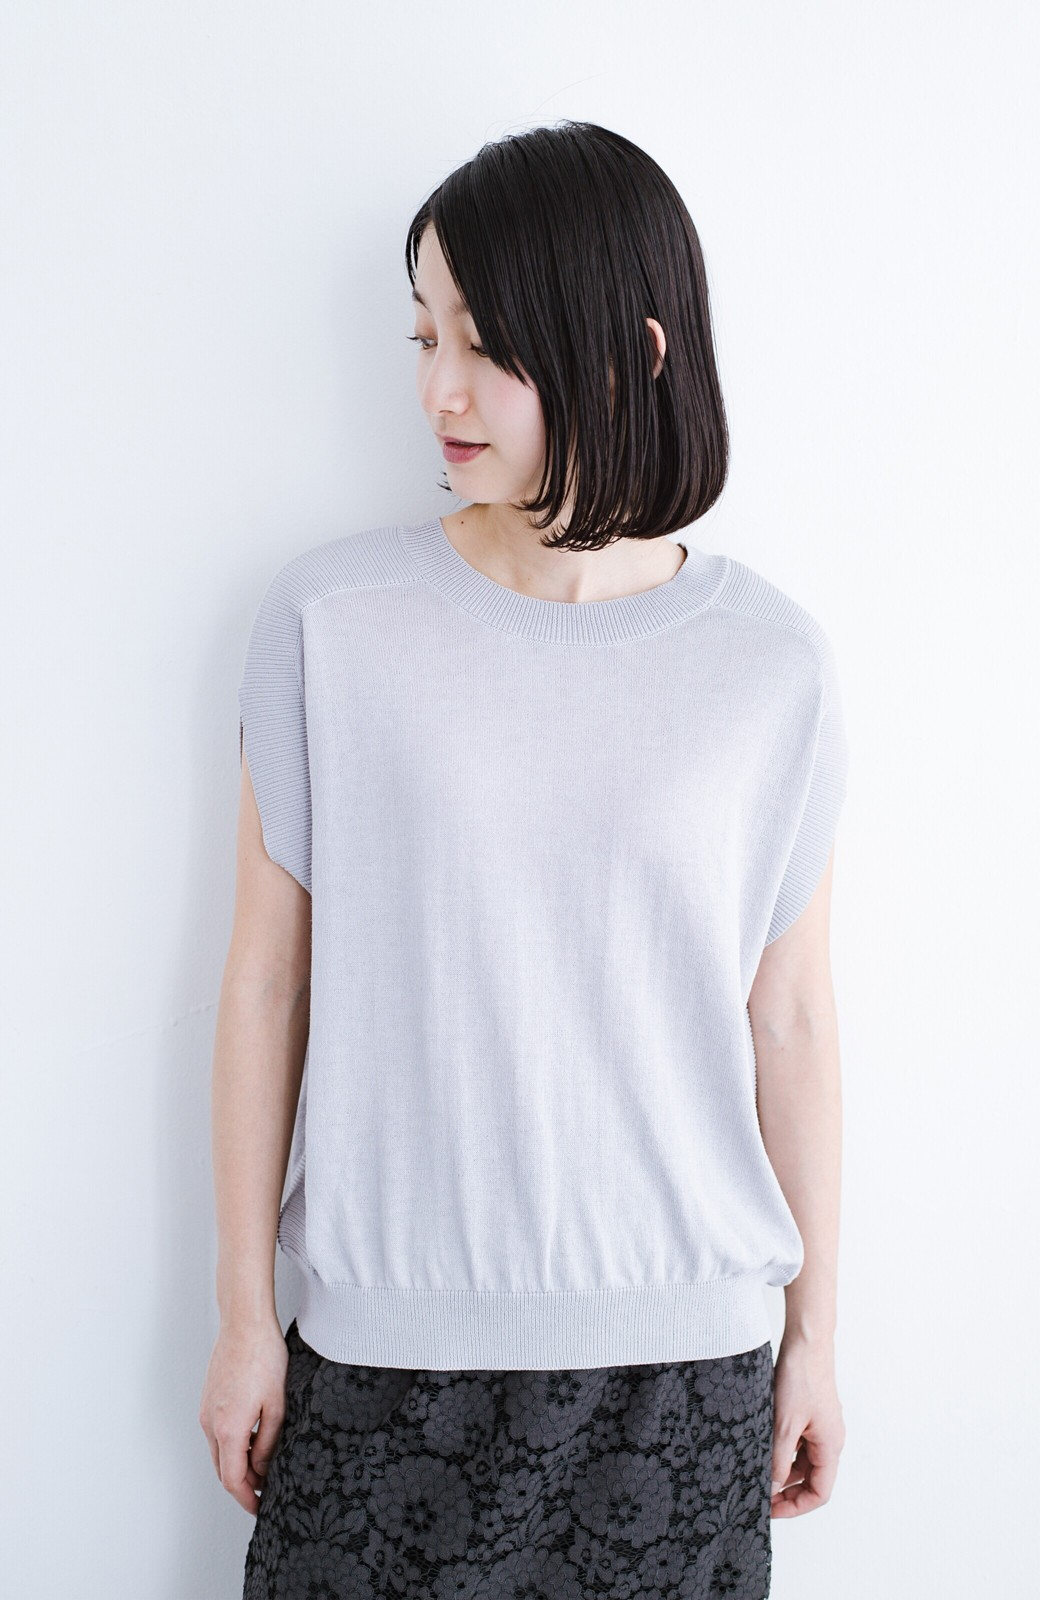 haco! カットソー感覚で着られる 洗えるオトナニットトップス by MAKORI <ライトグレー>の商品写真12